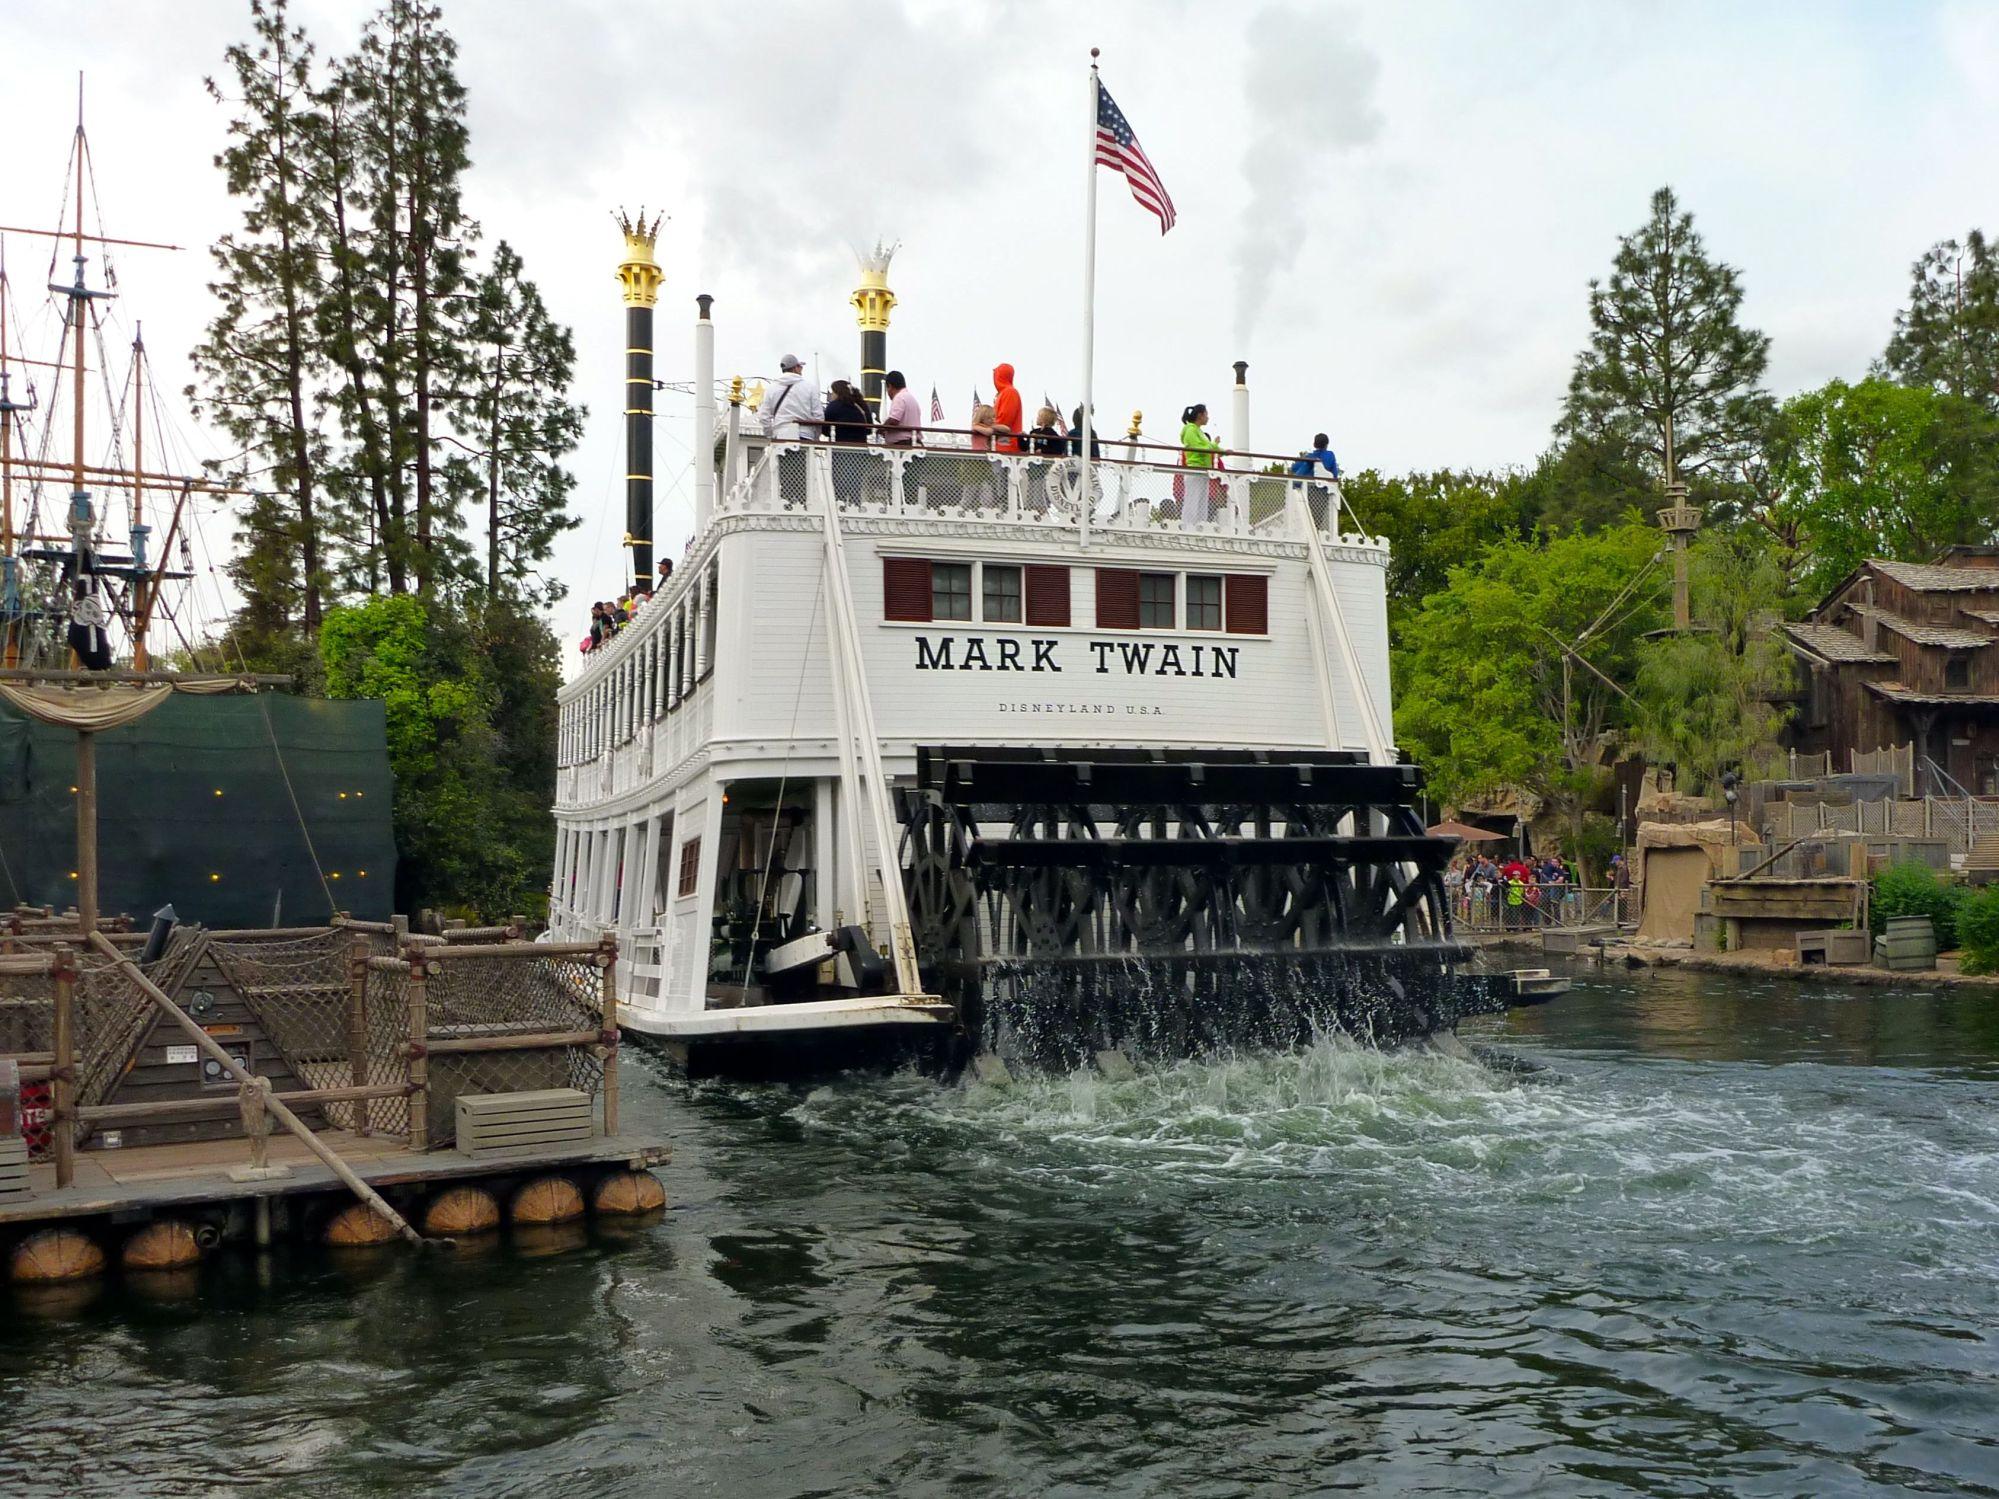 Disneyland Mark Twain Riverboat - Simple Sojourns